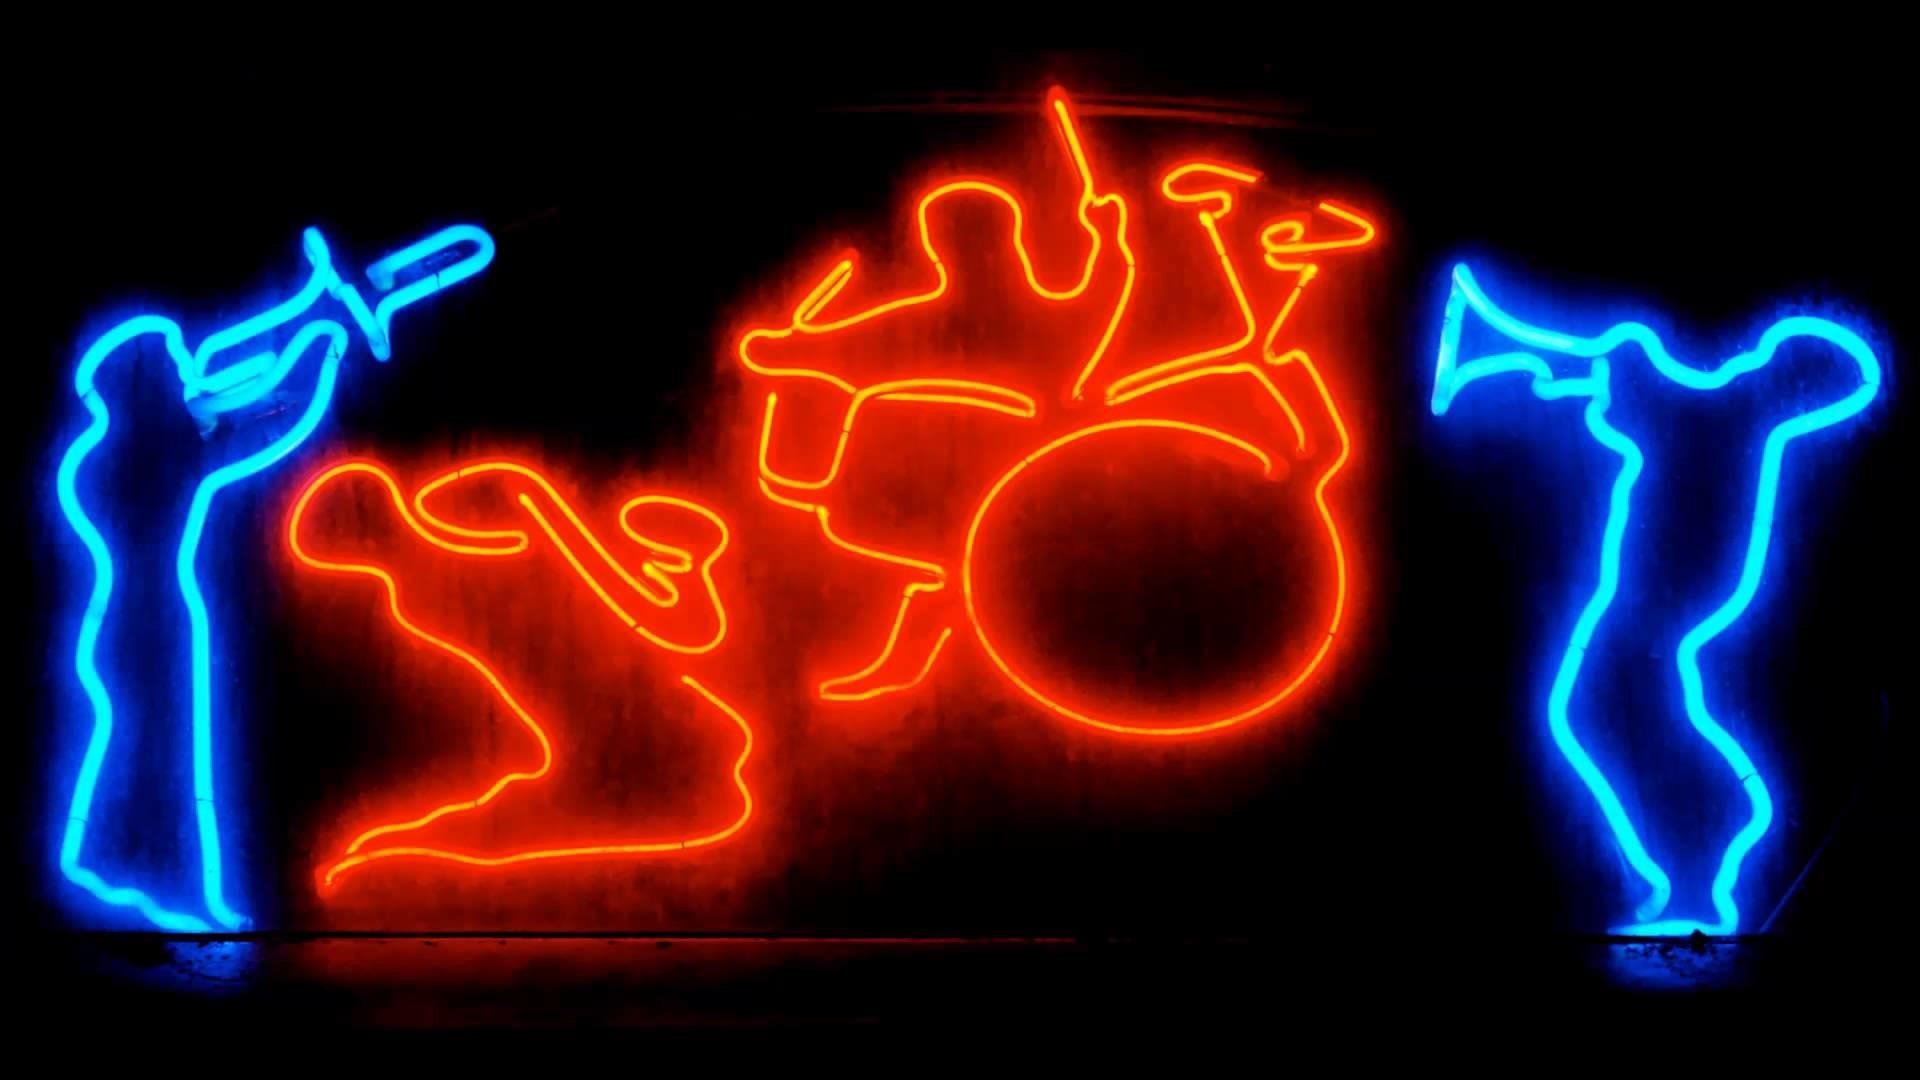 Good Electro Swing Jazz Swing Hop 2014 Music Mix, great (S Strong) upbeat  Instrumental jazz music – YouTube